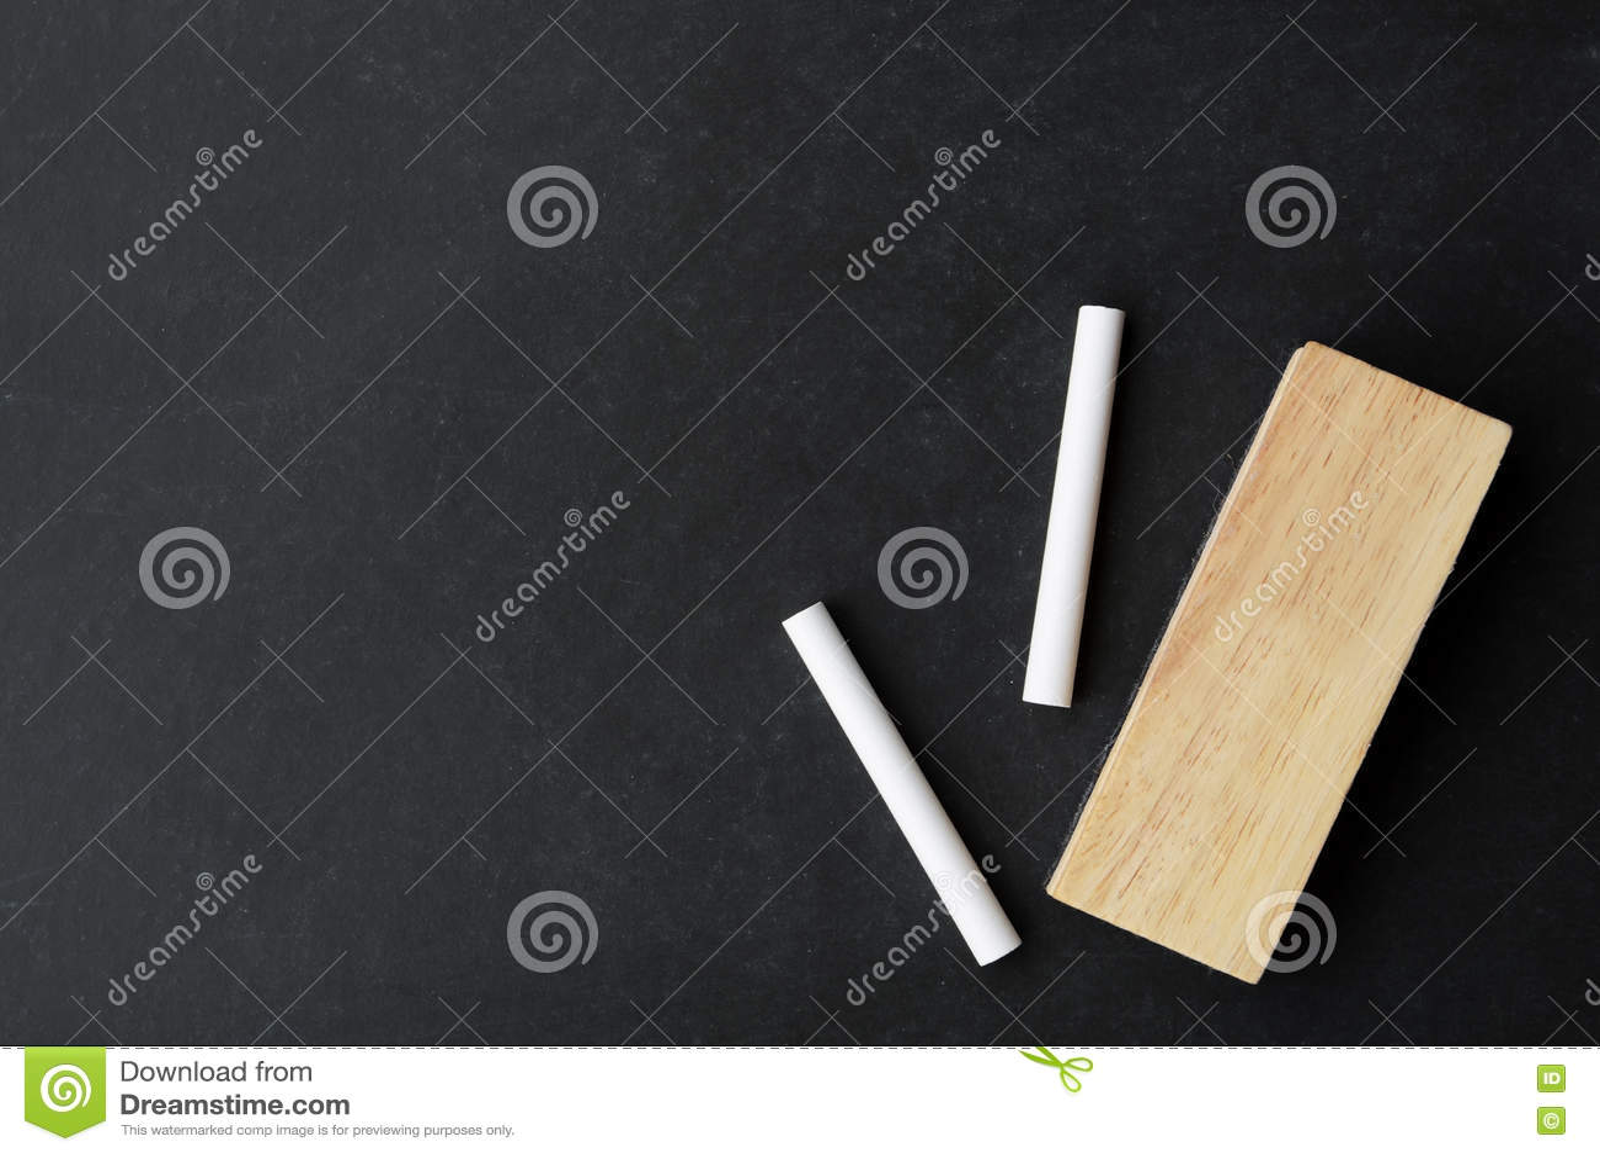 chalk and eraser on